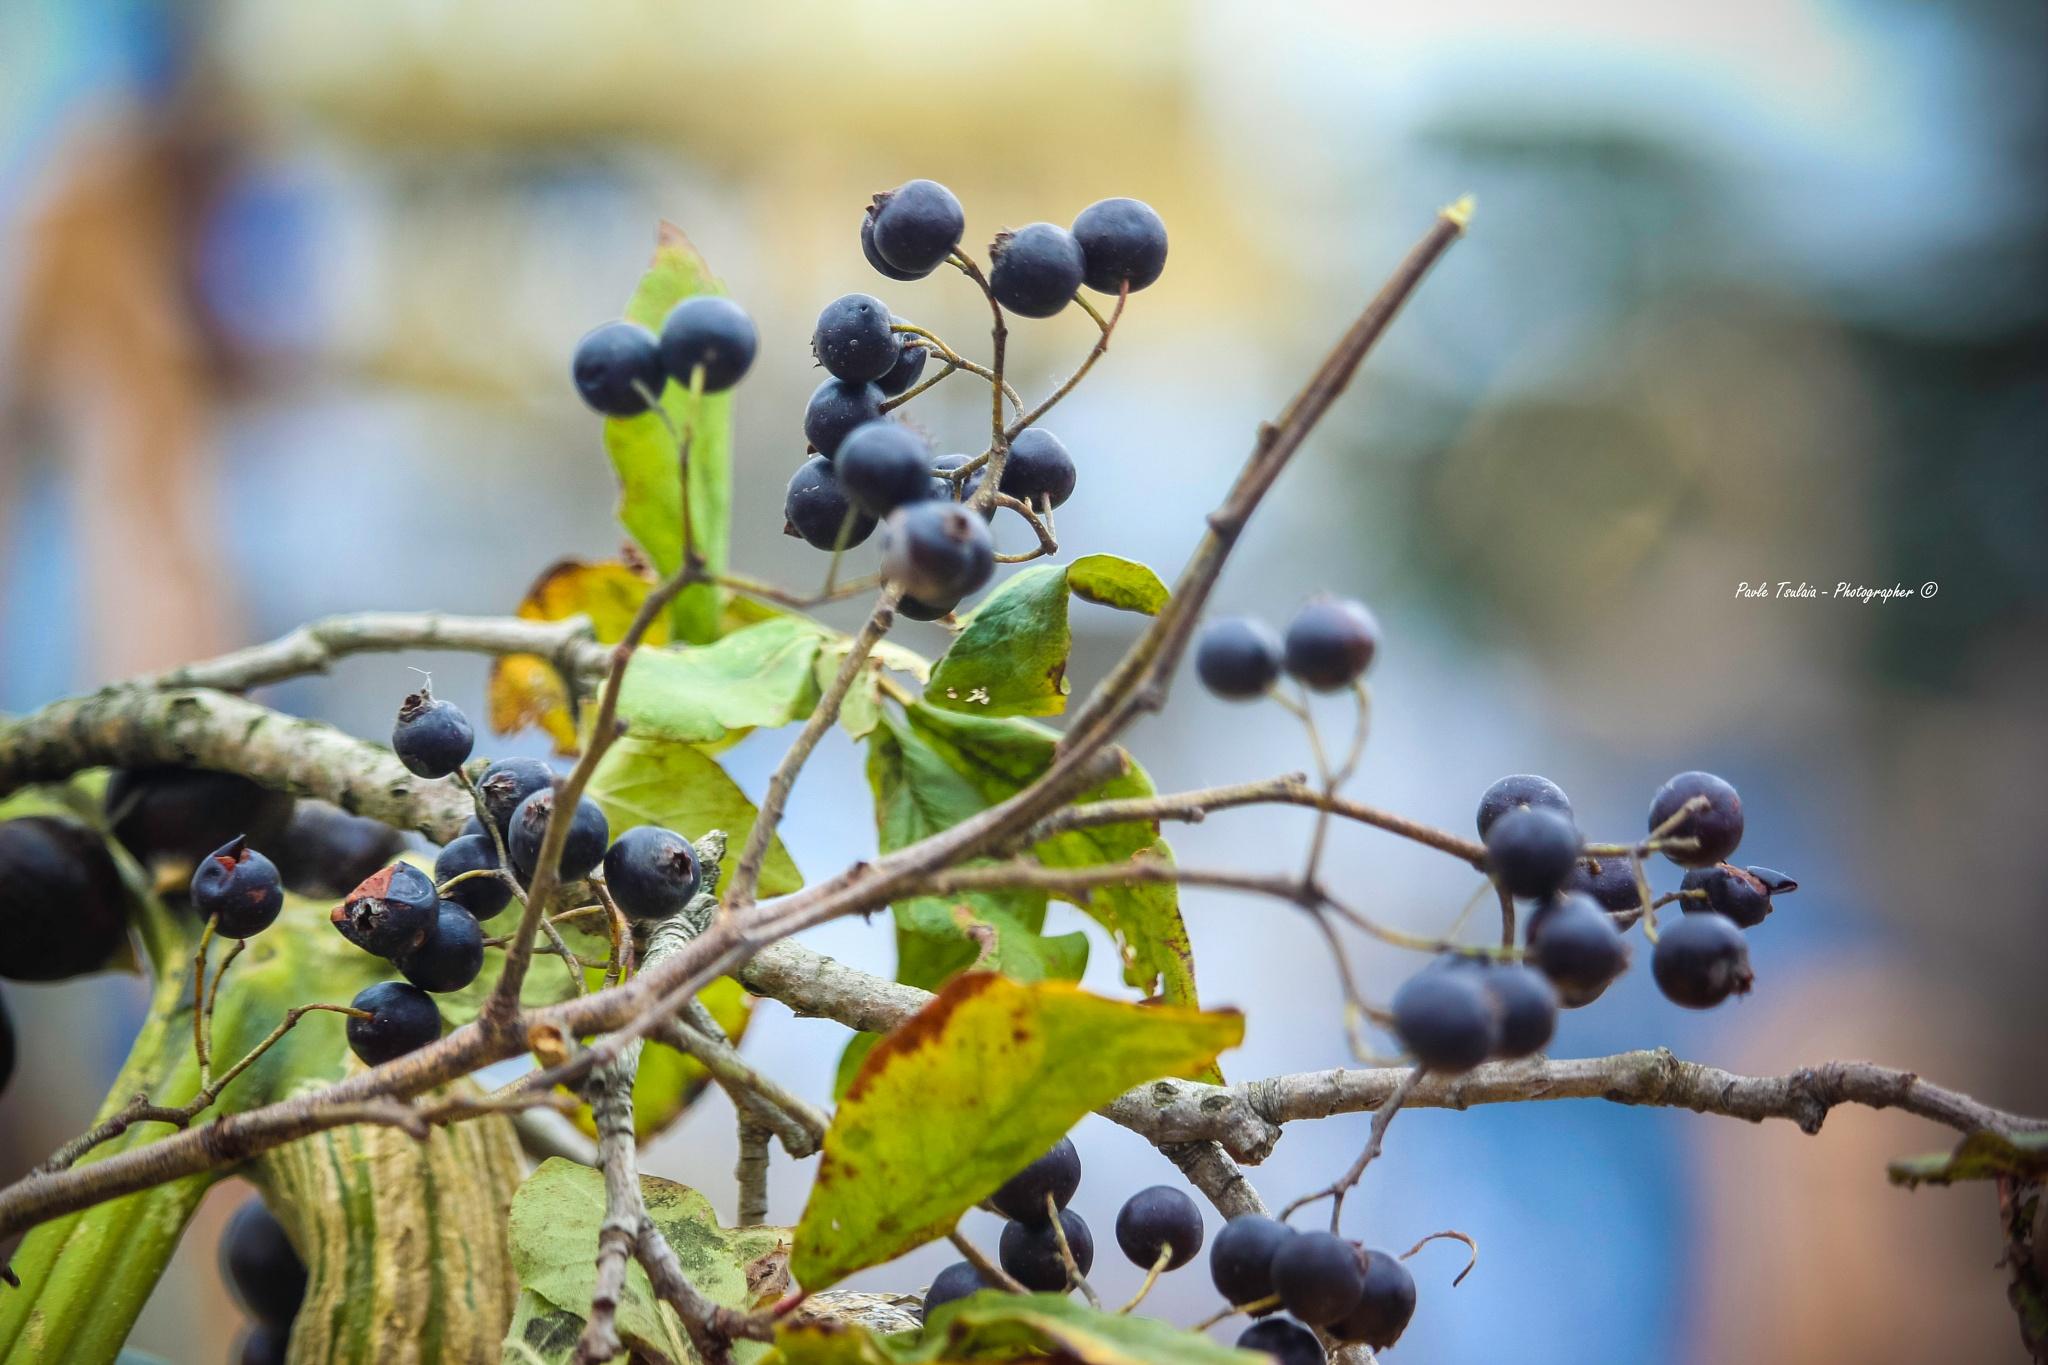 Black Hawthorn by pavle tsulaia